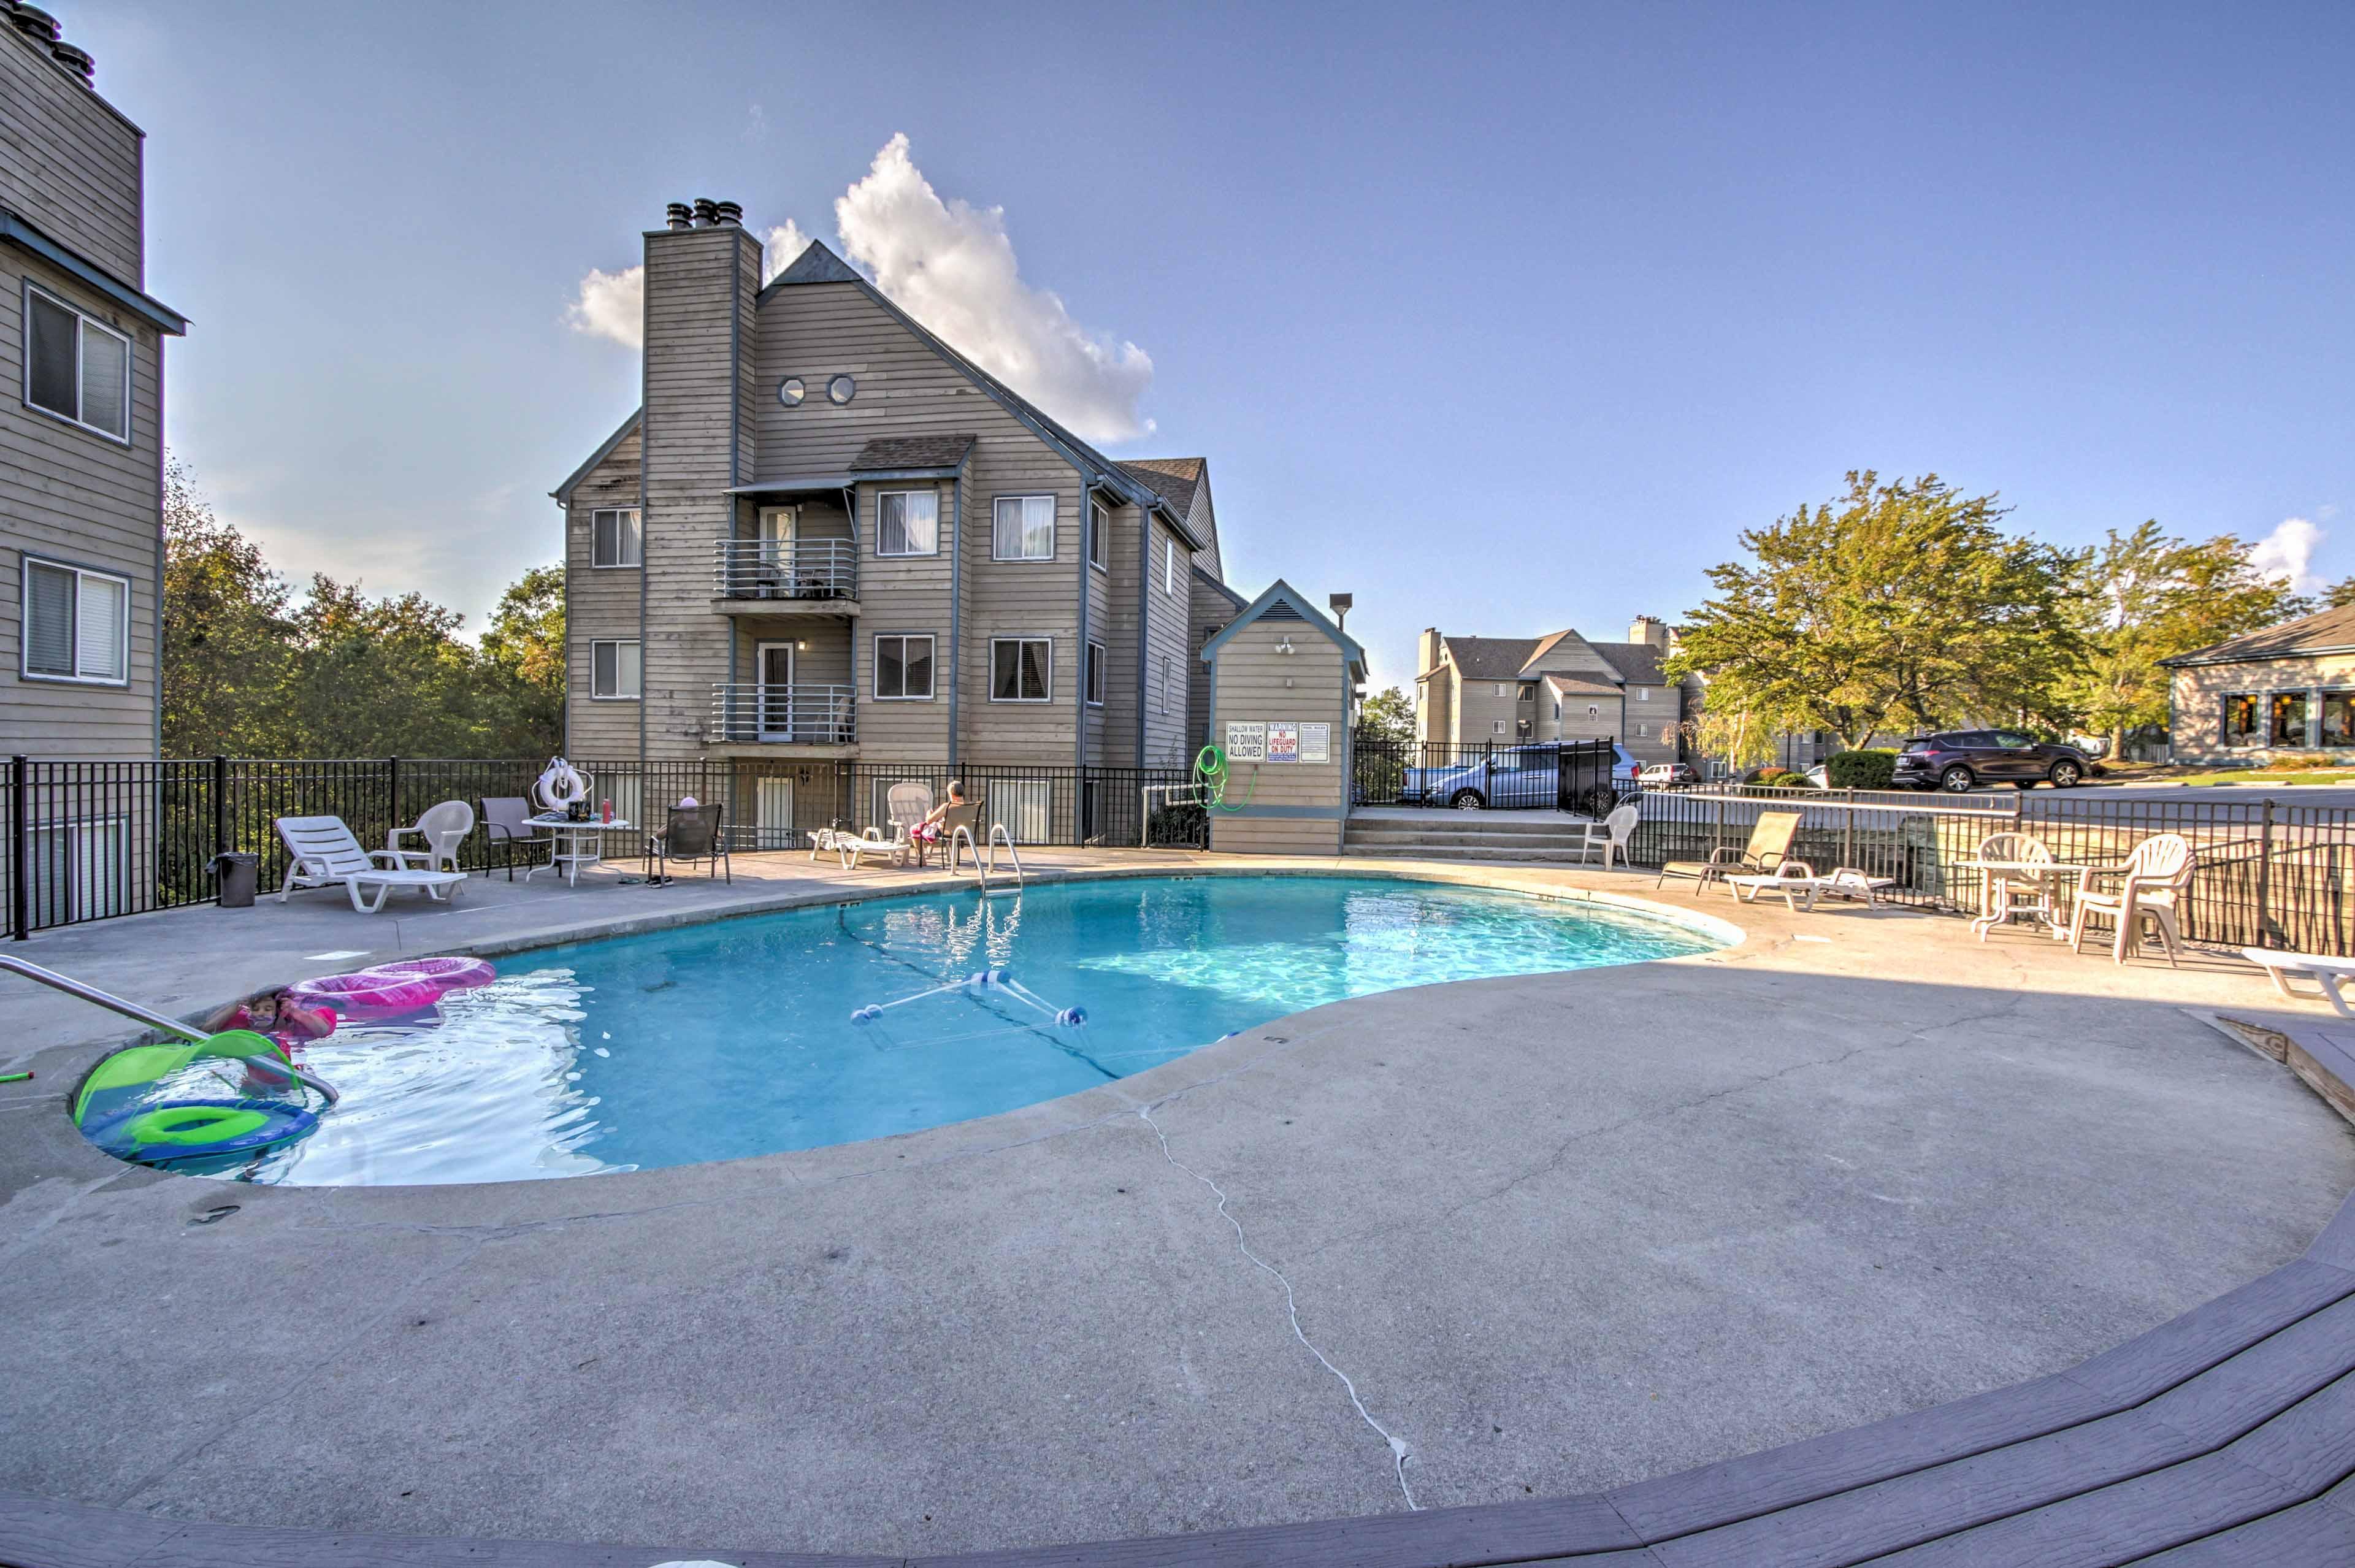 Splash around in the seasonal outdoor pool.